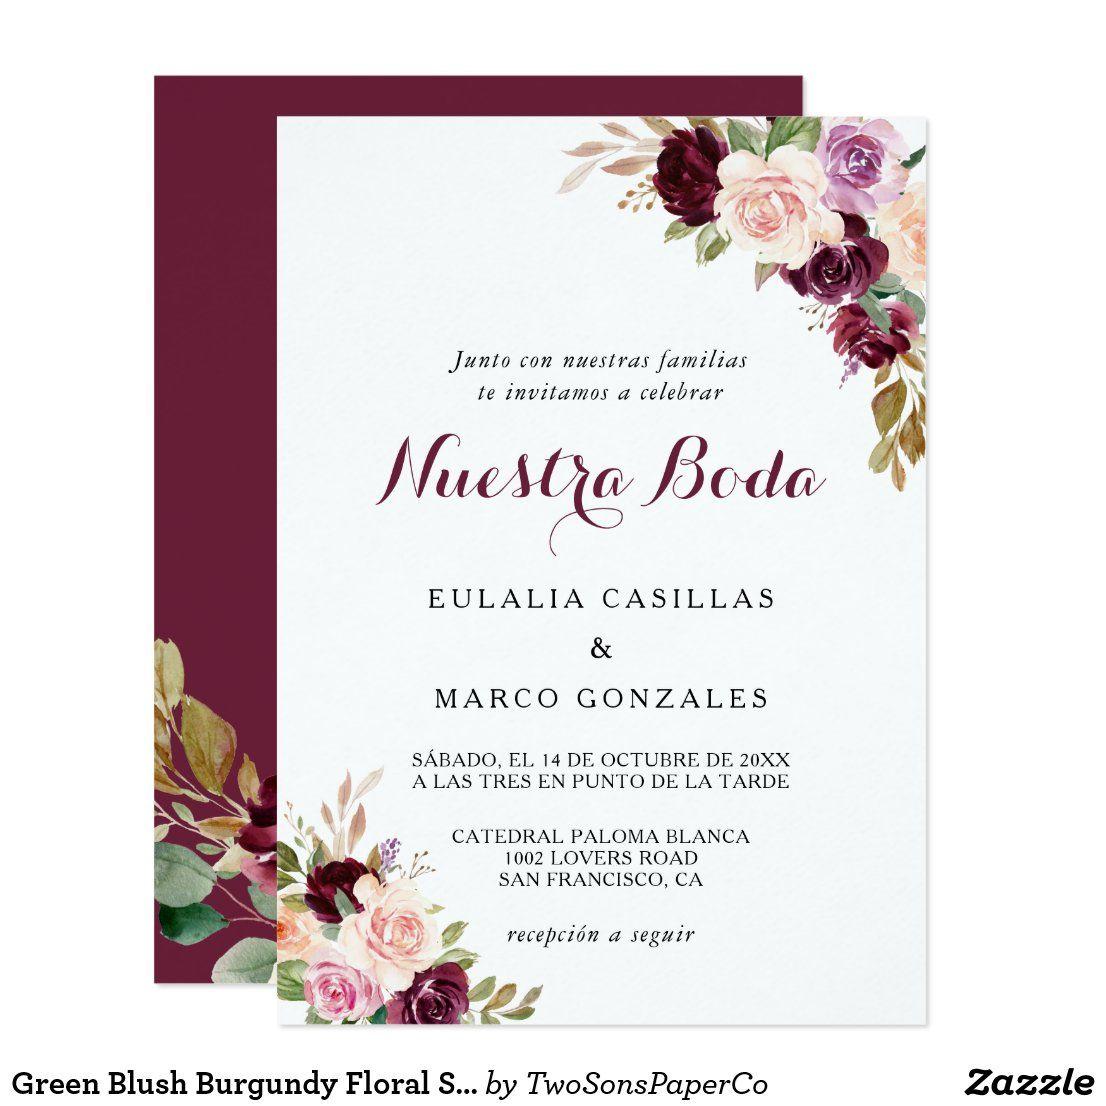 Green Blush Burgundy Floral Spanish Wedding Invitation Zazzle Com Spanish Wedding Invitations Purple Wedding Invitations Rustic Wood Wedding Invitations